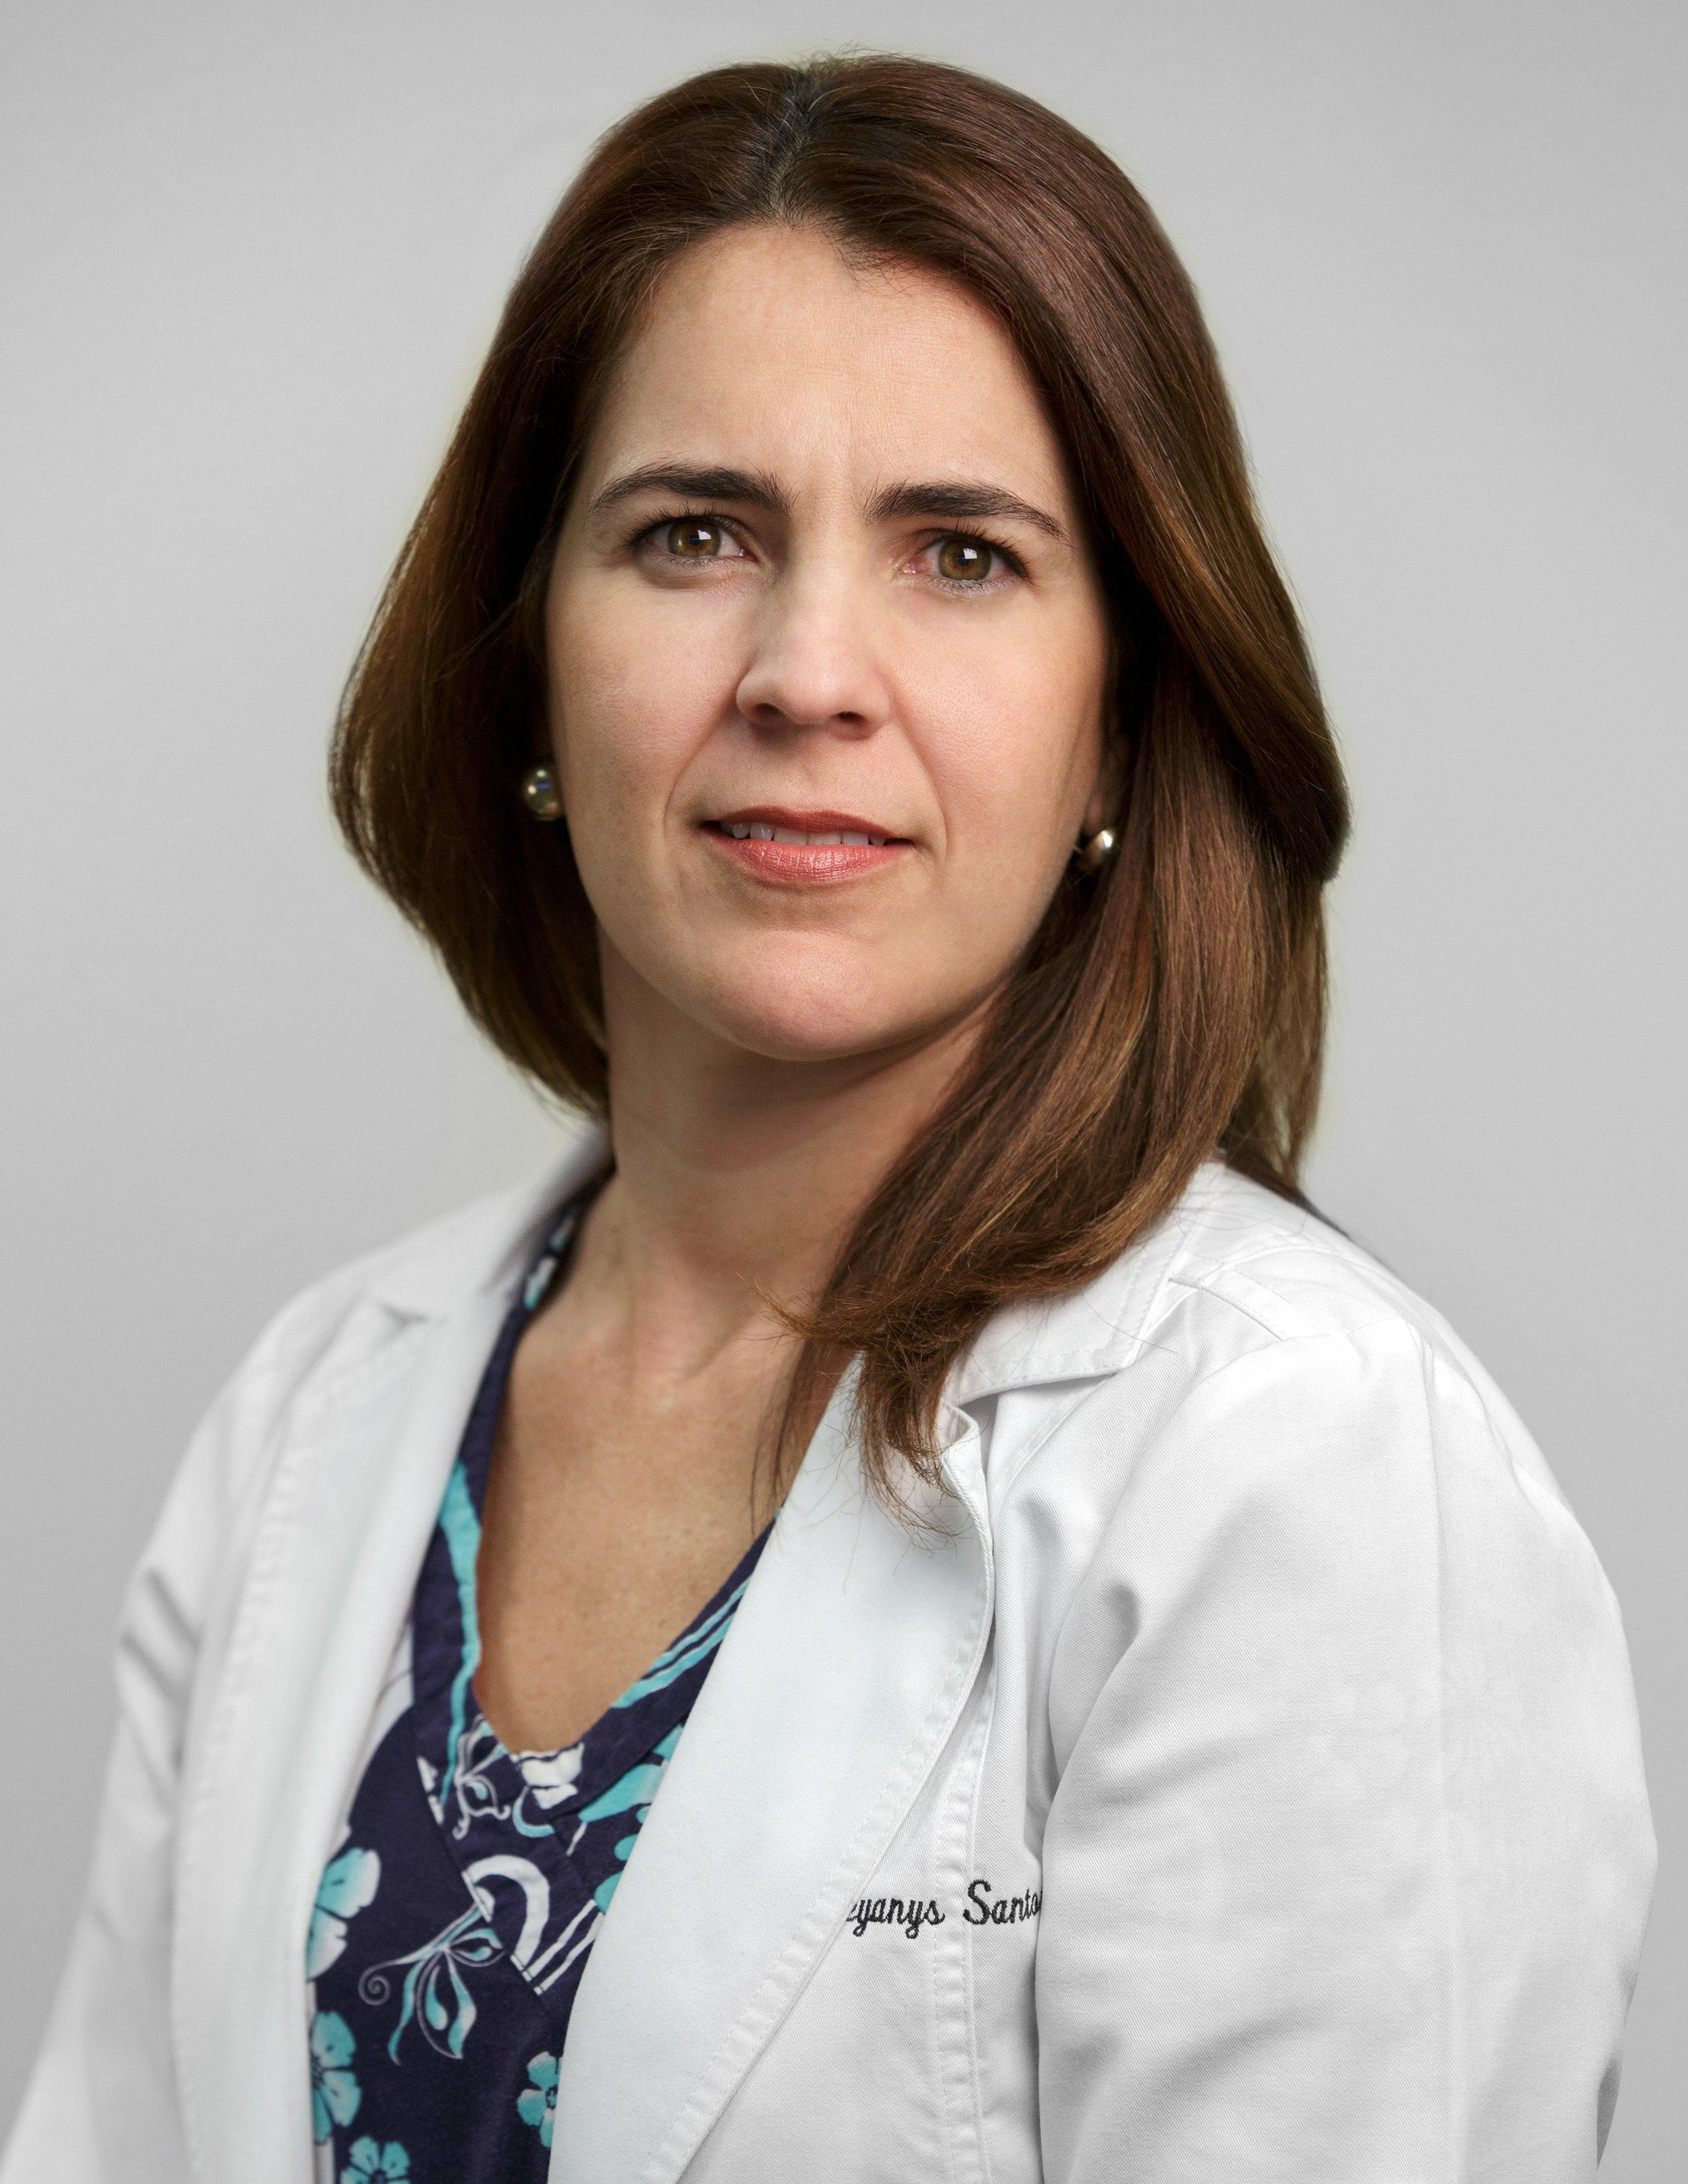 Leyanis Santos, R.Ph - Pharmacy